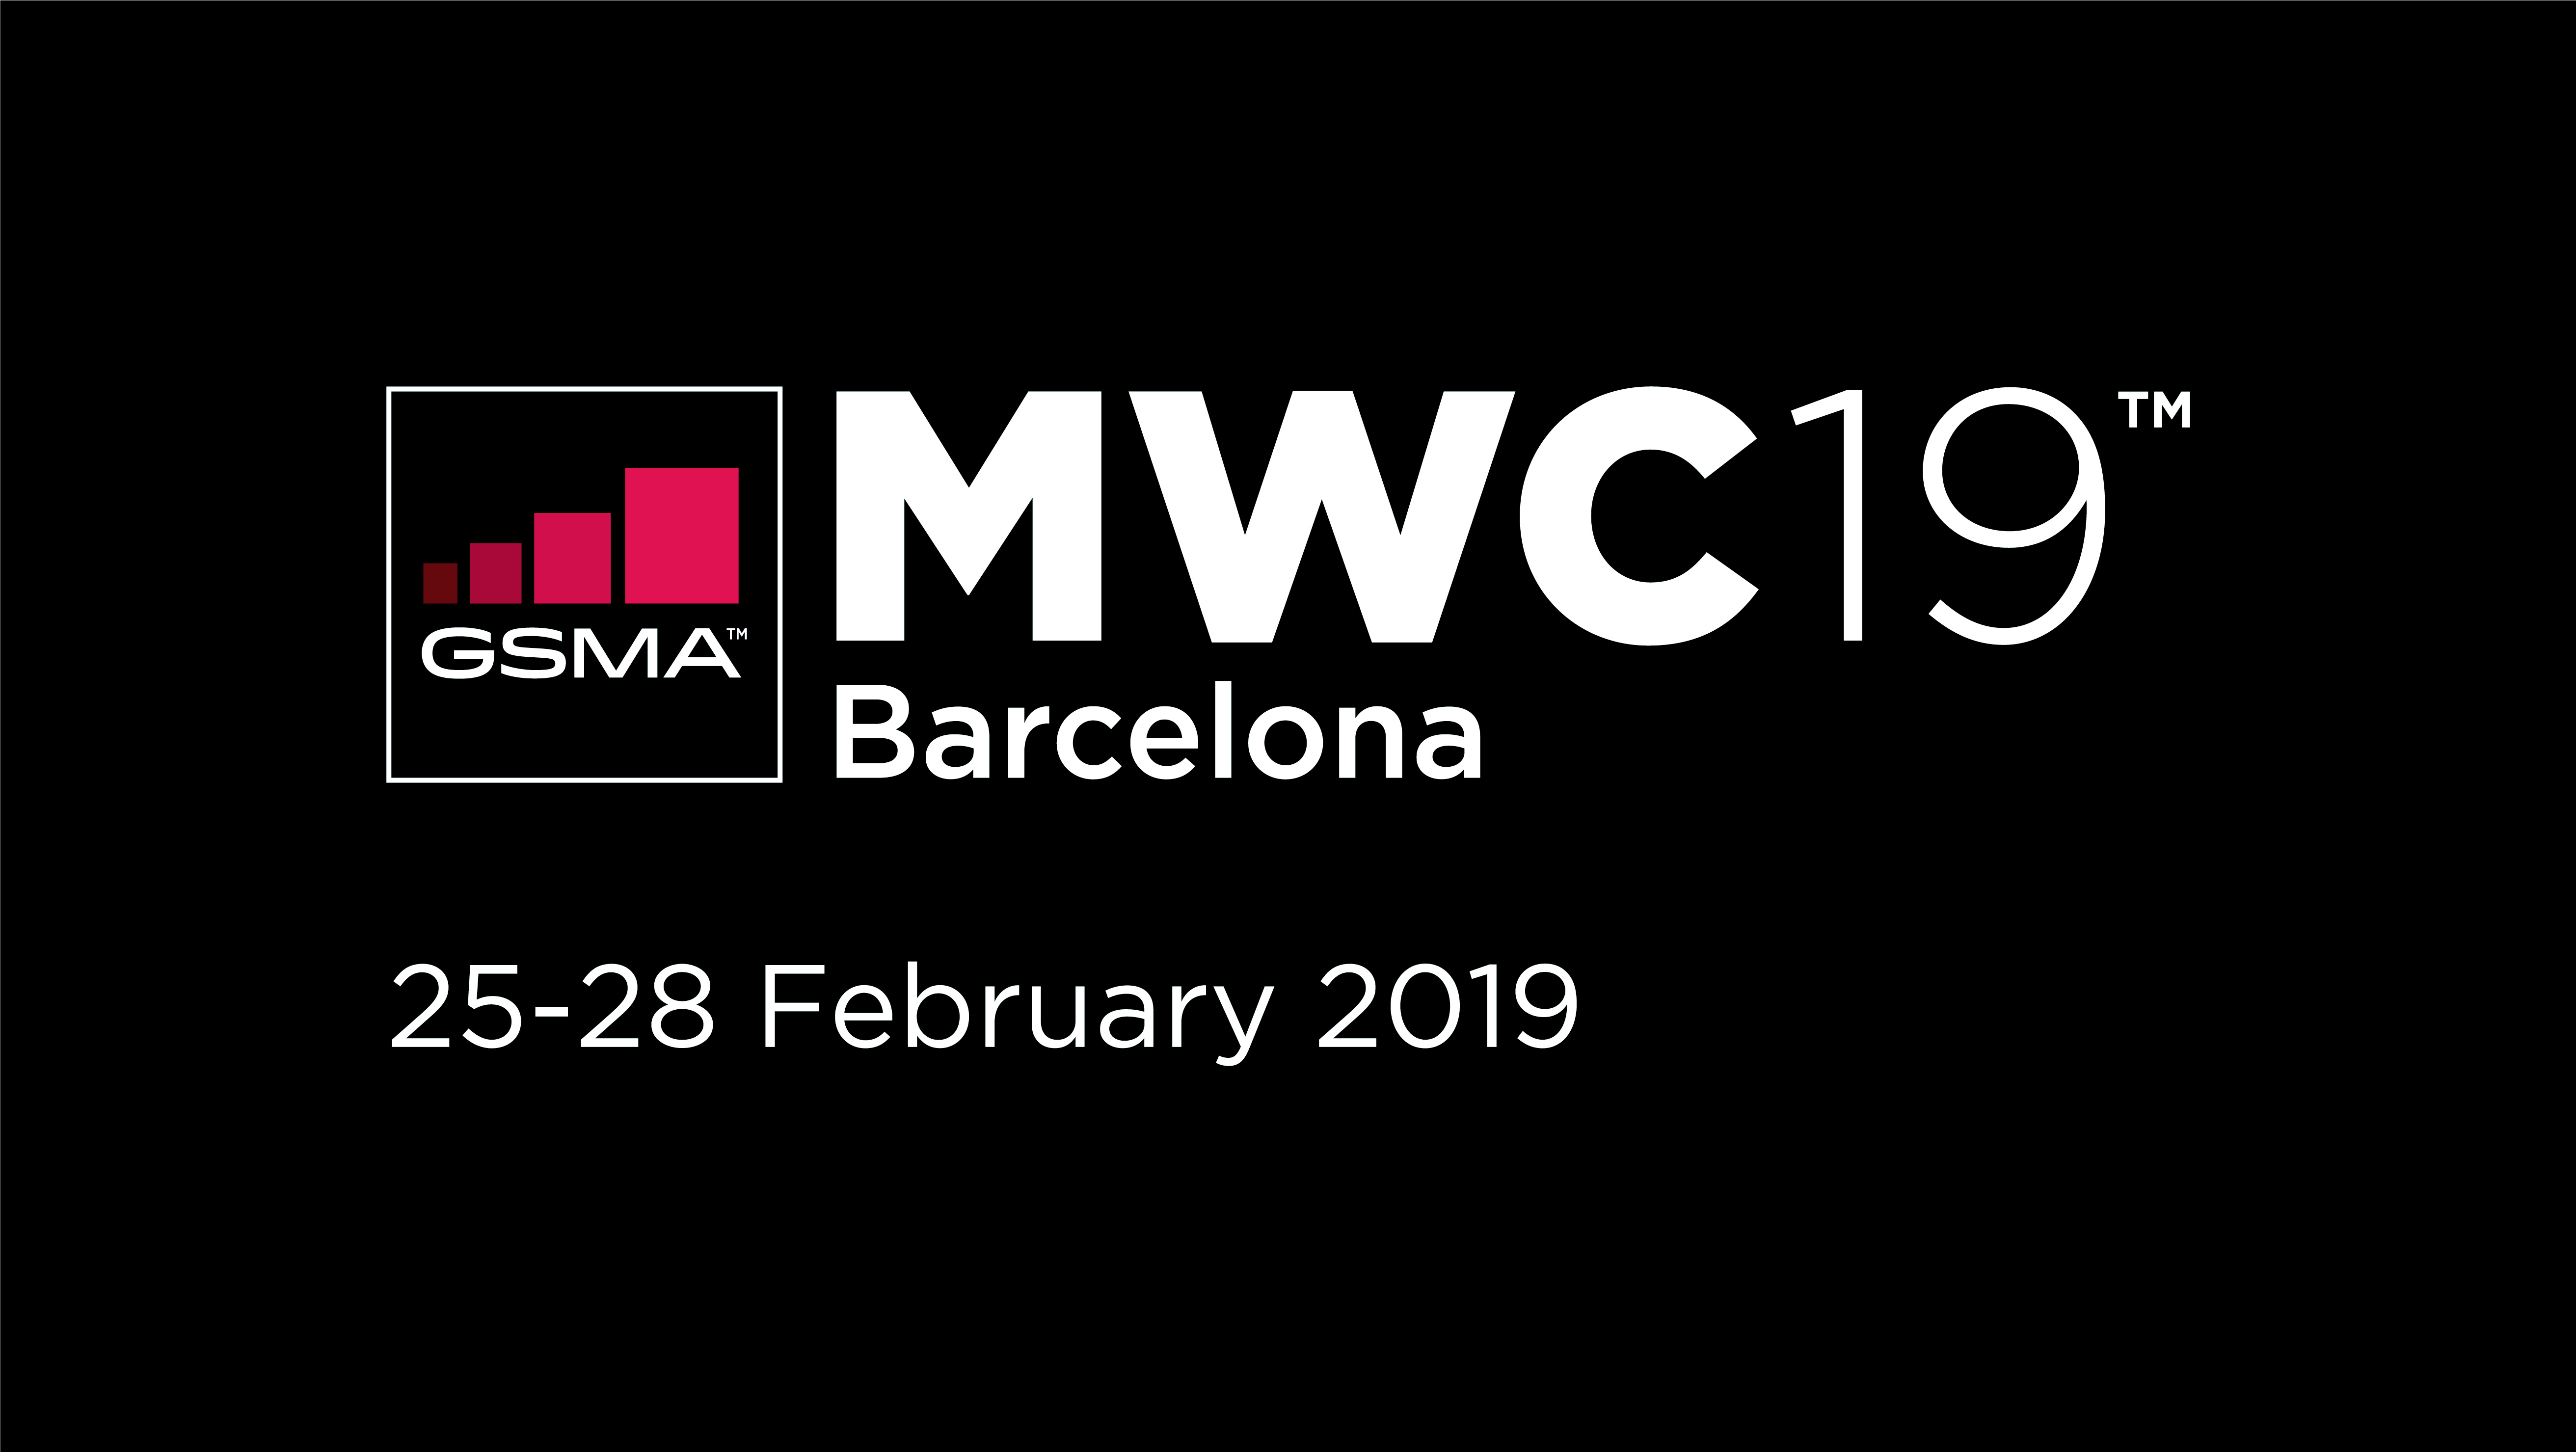 Eventos Speed Dating Barcelona: Próximos meses...